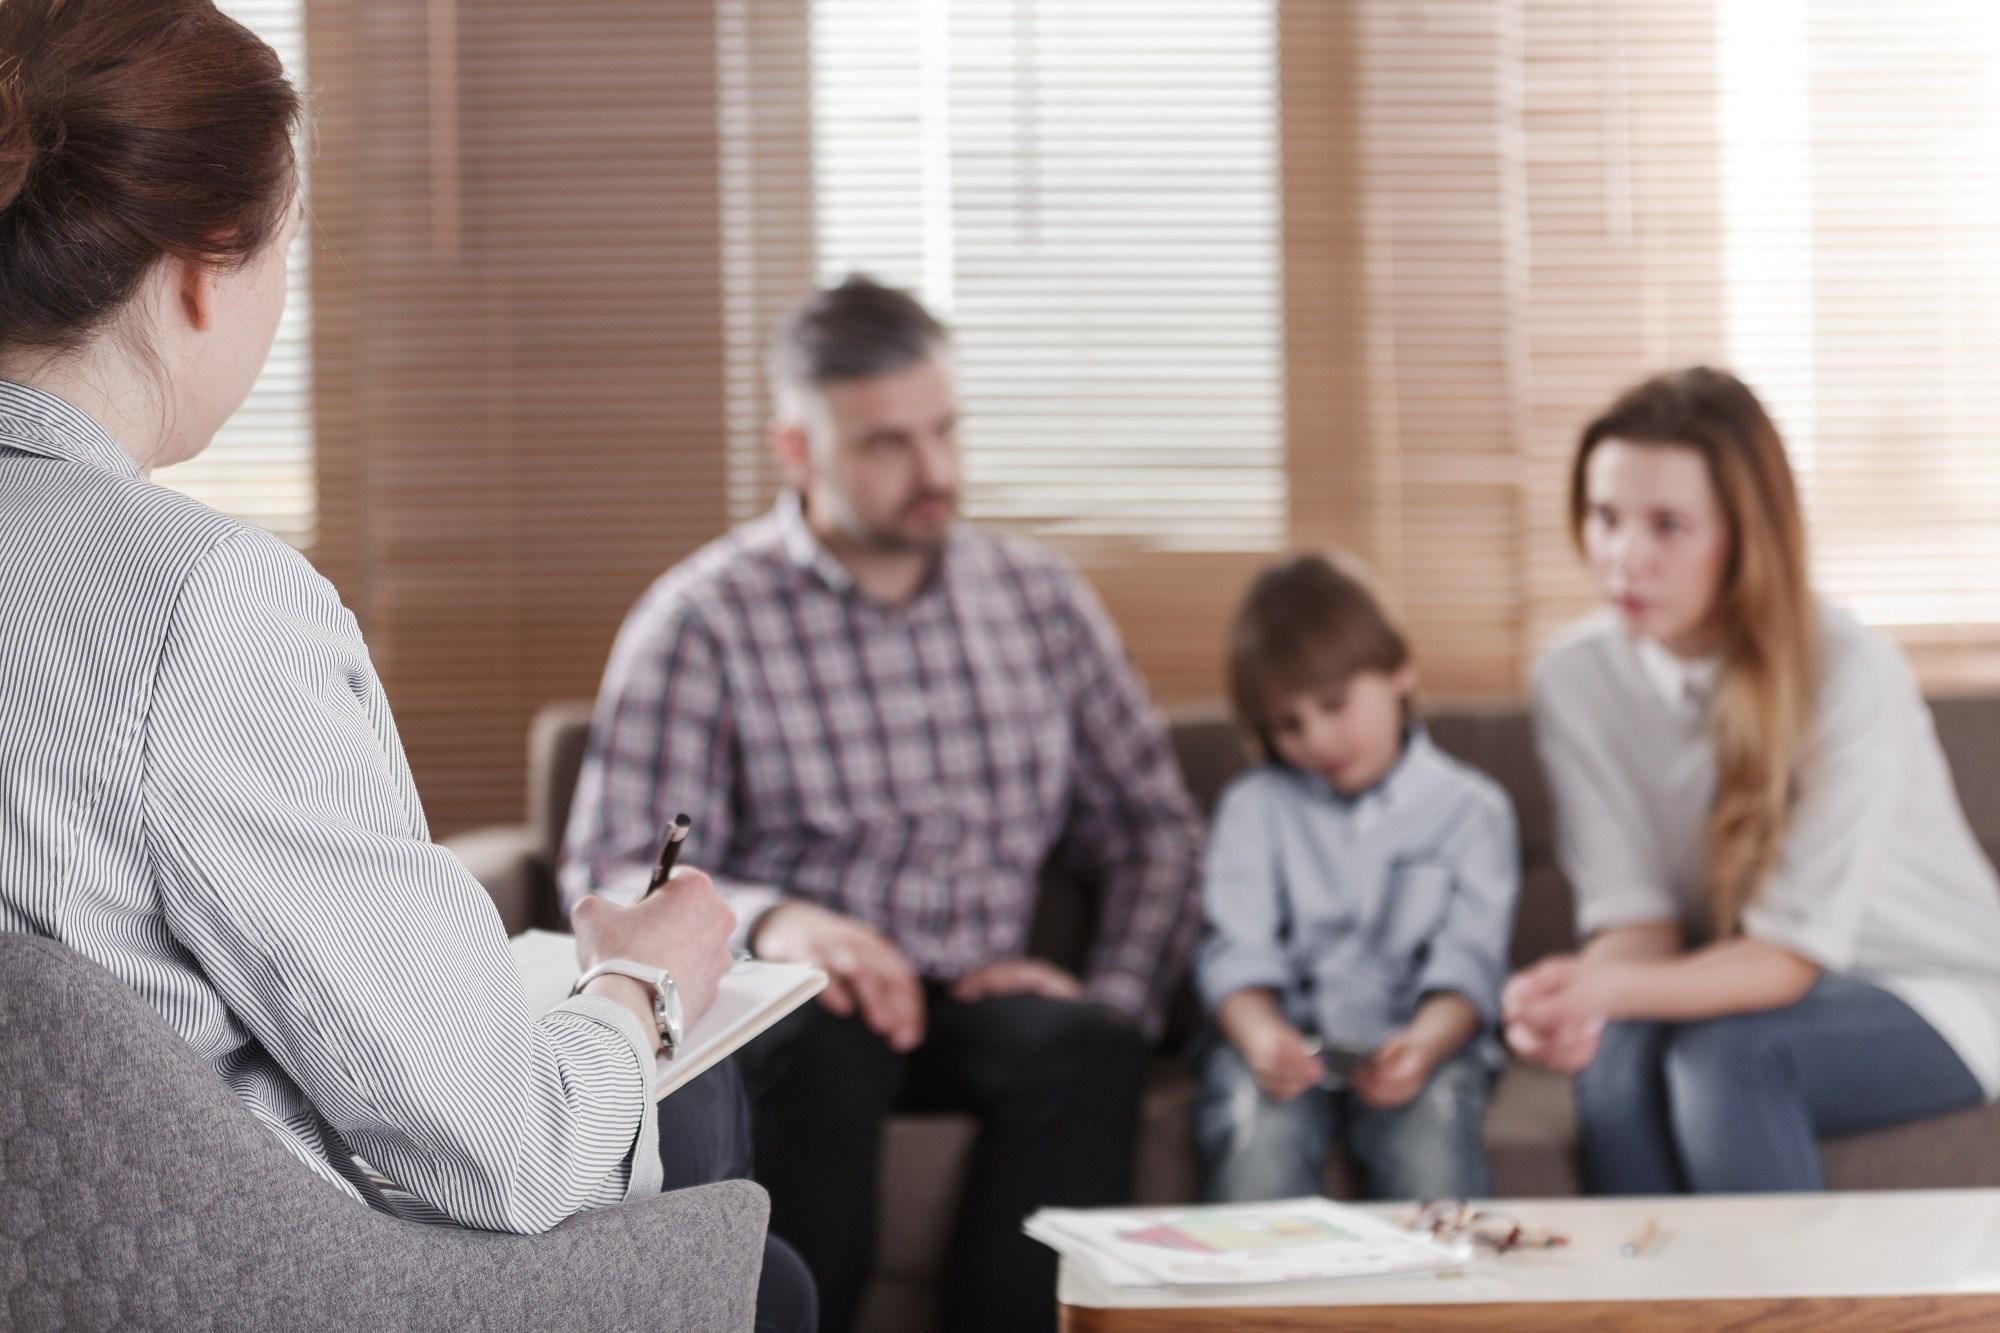 Parent-Child Interactive Intervention Cuts Depression